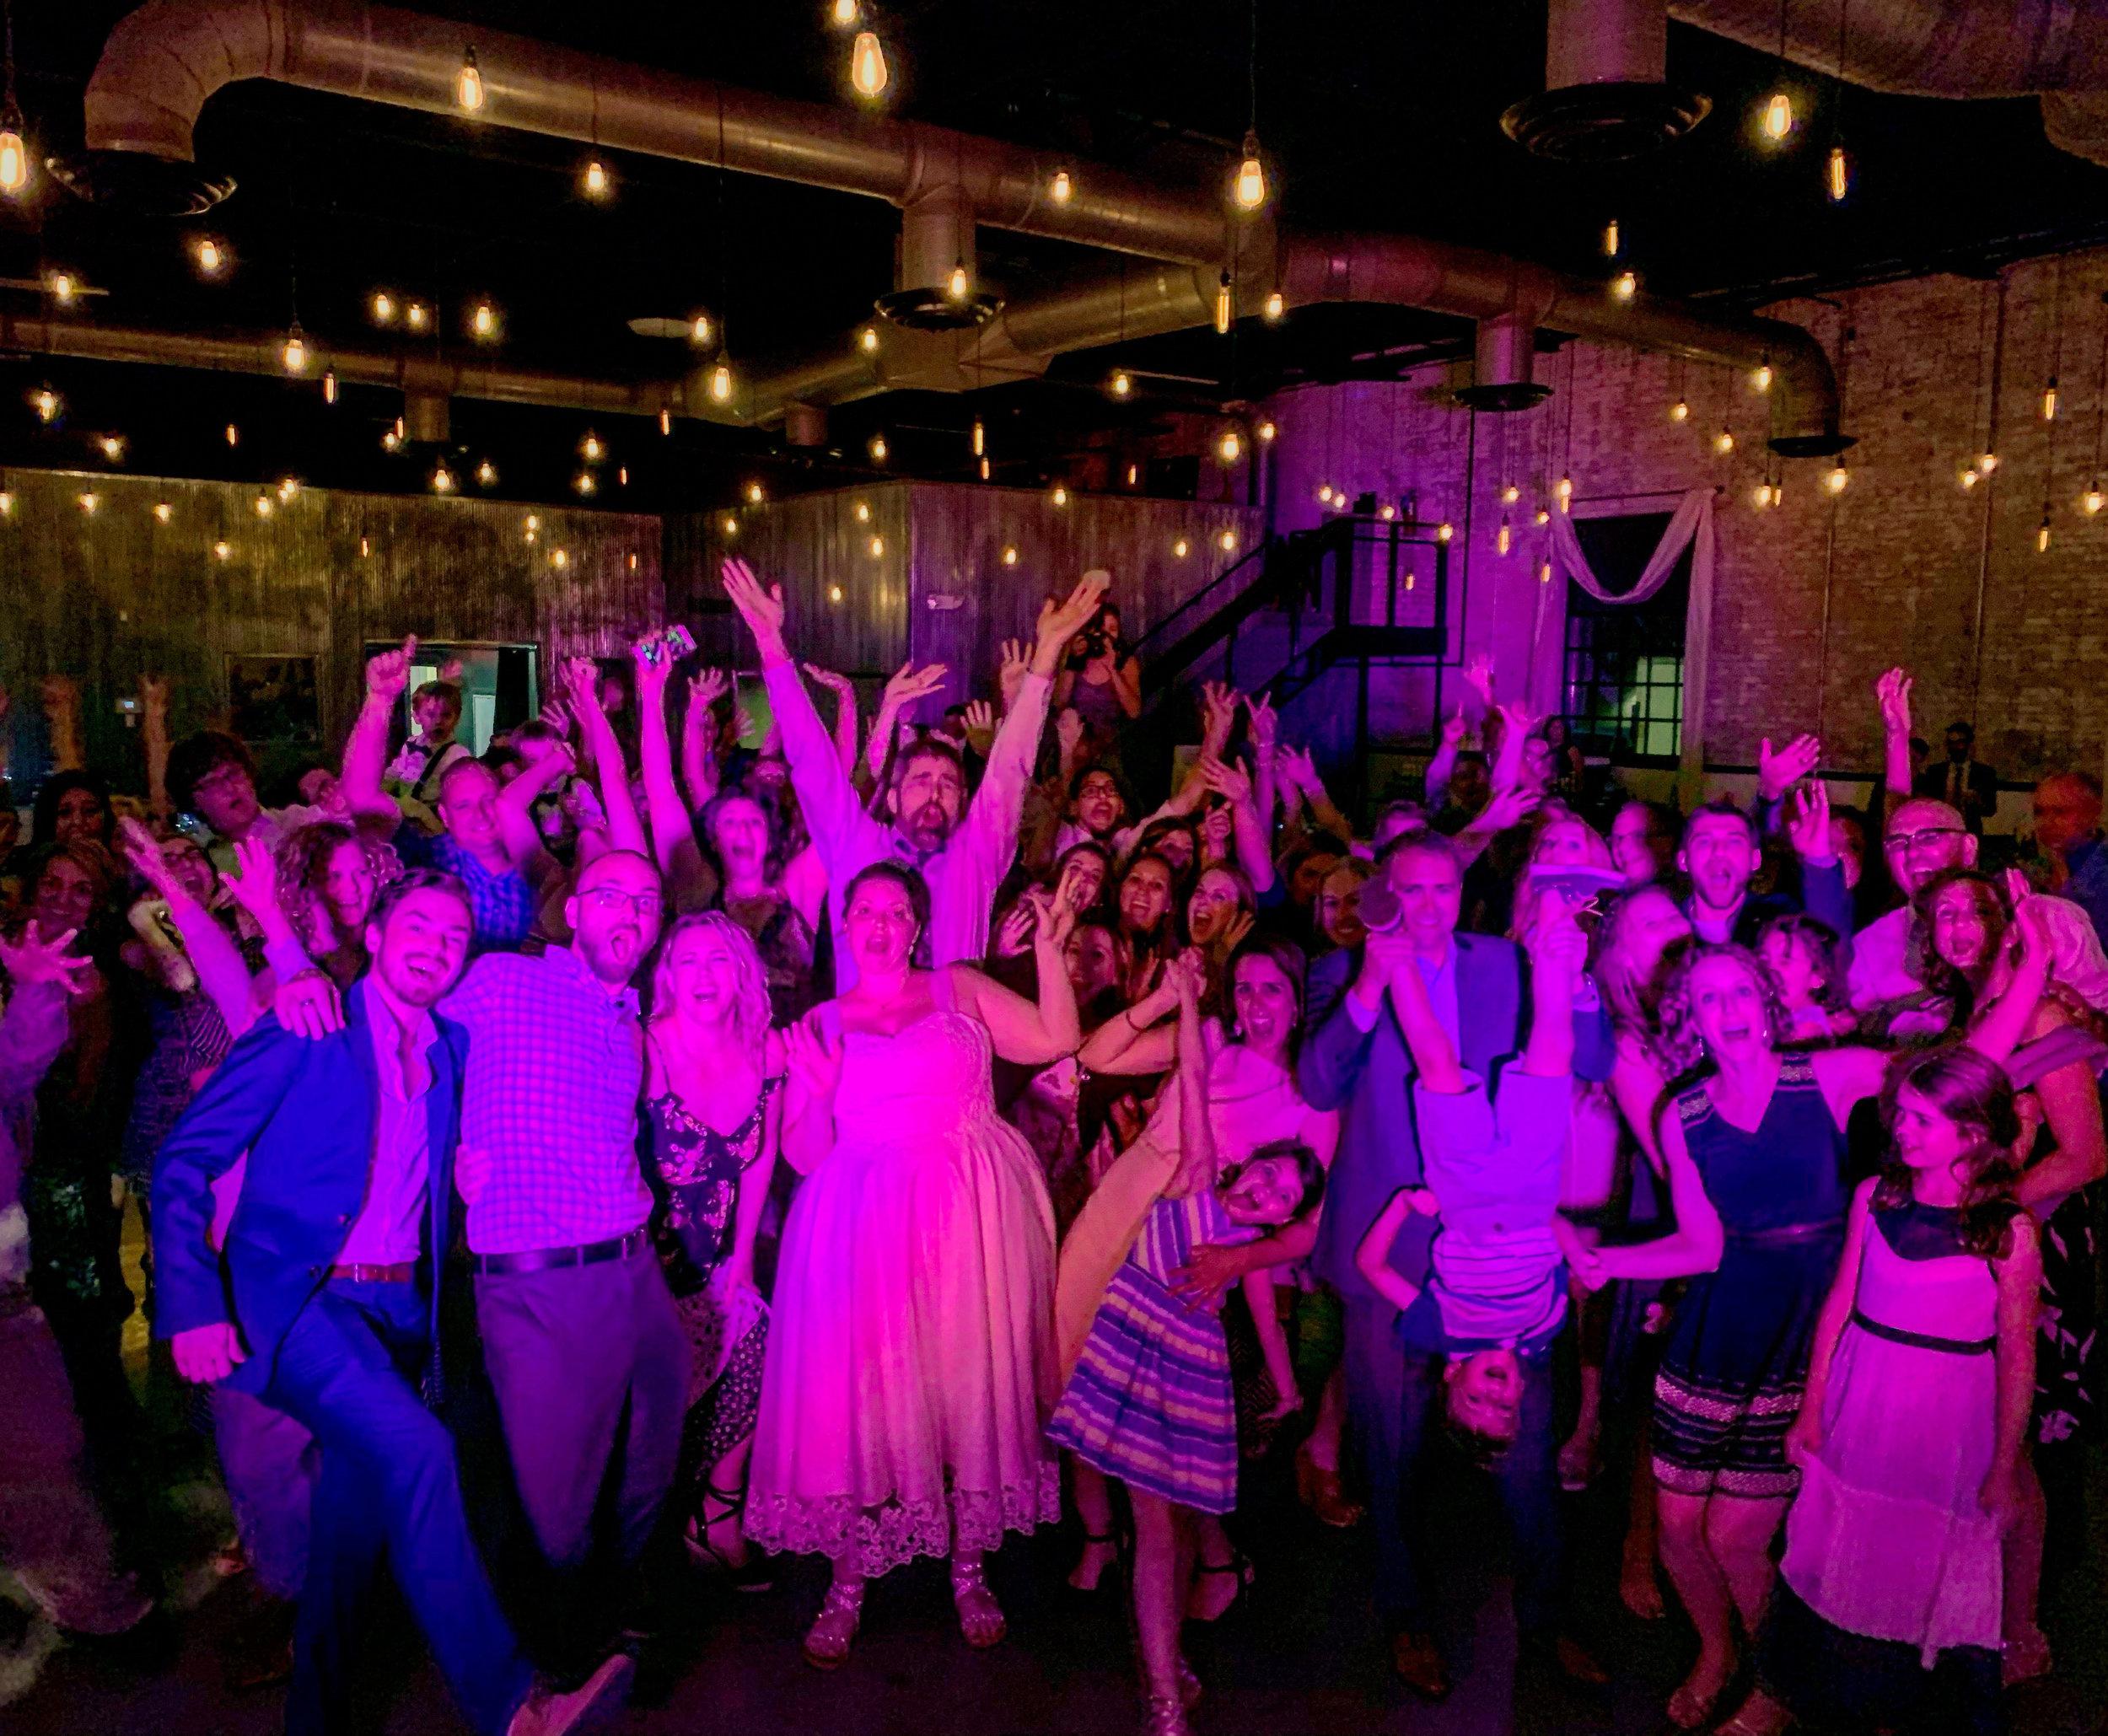 Fun wedding DJ at the Brick in South Bend, IN